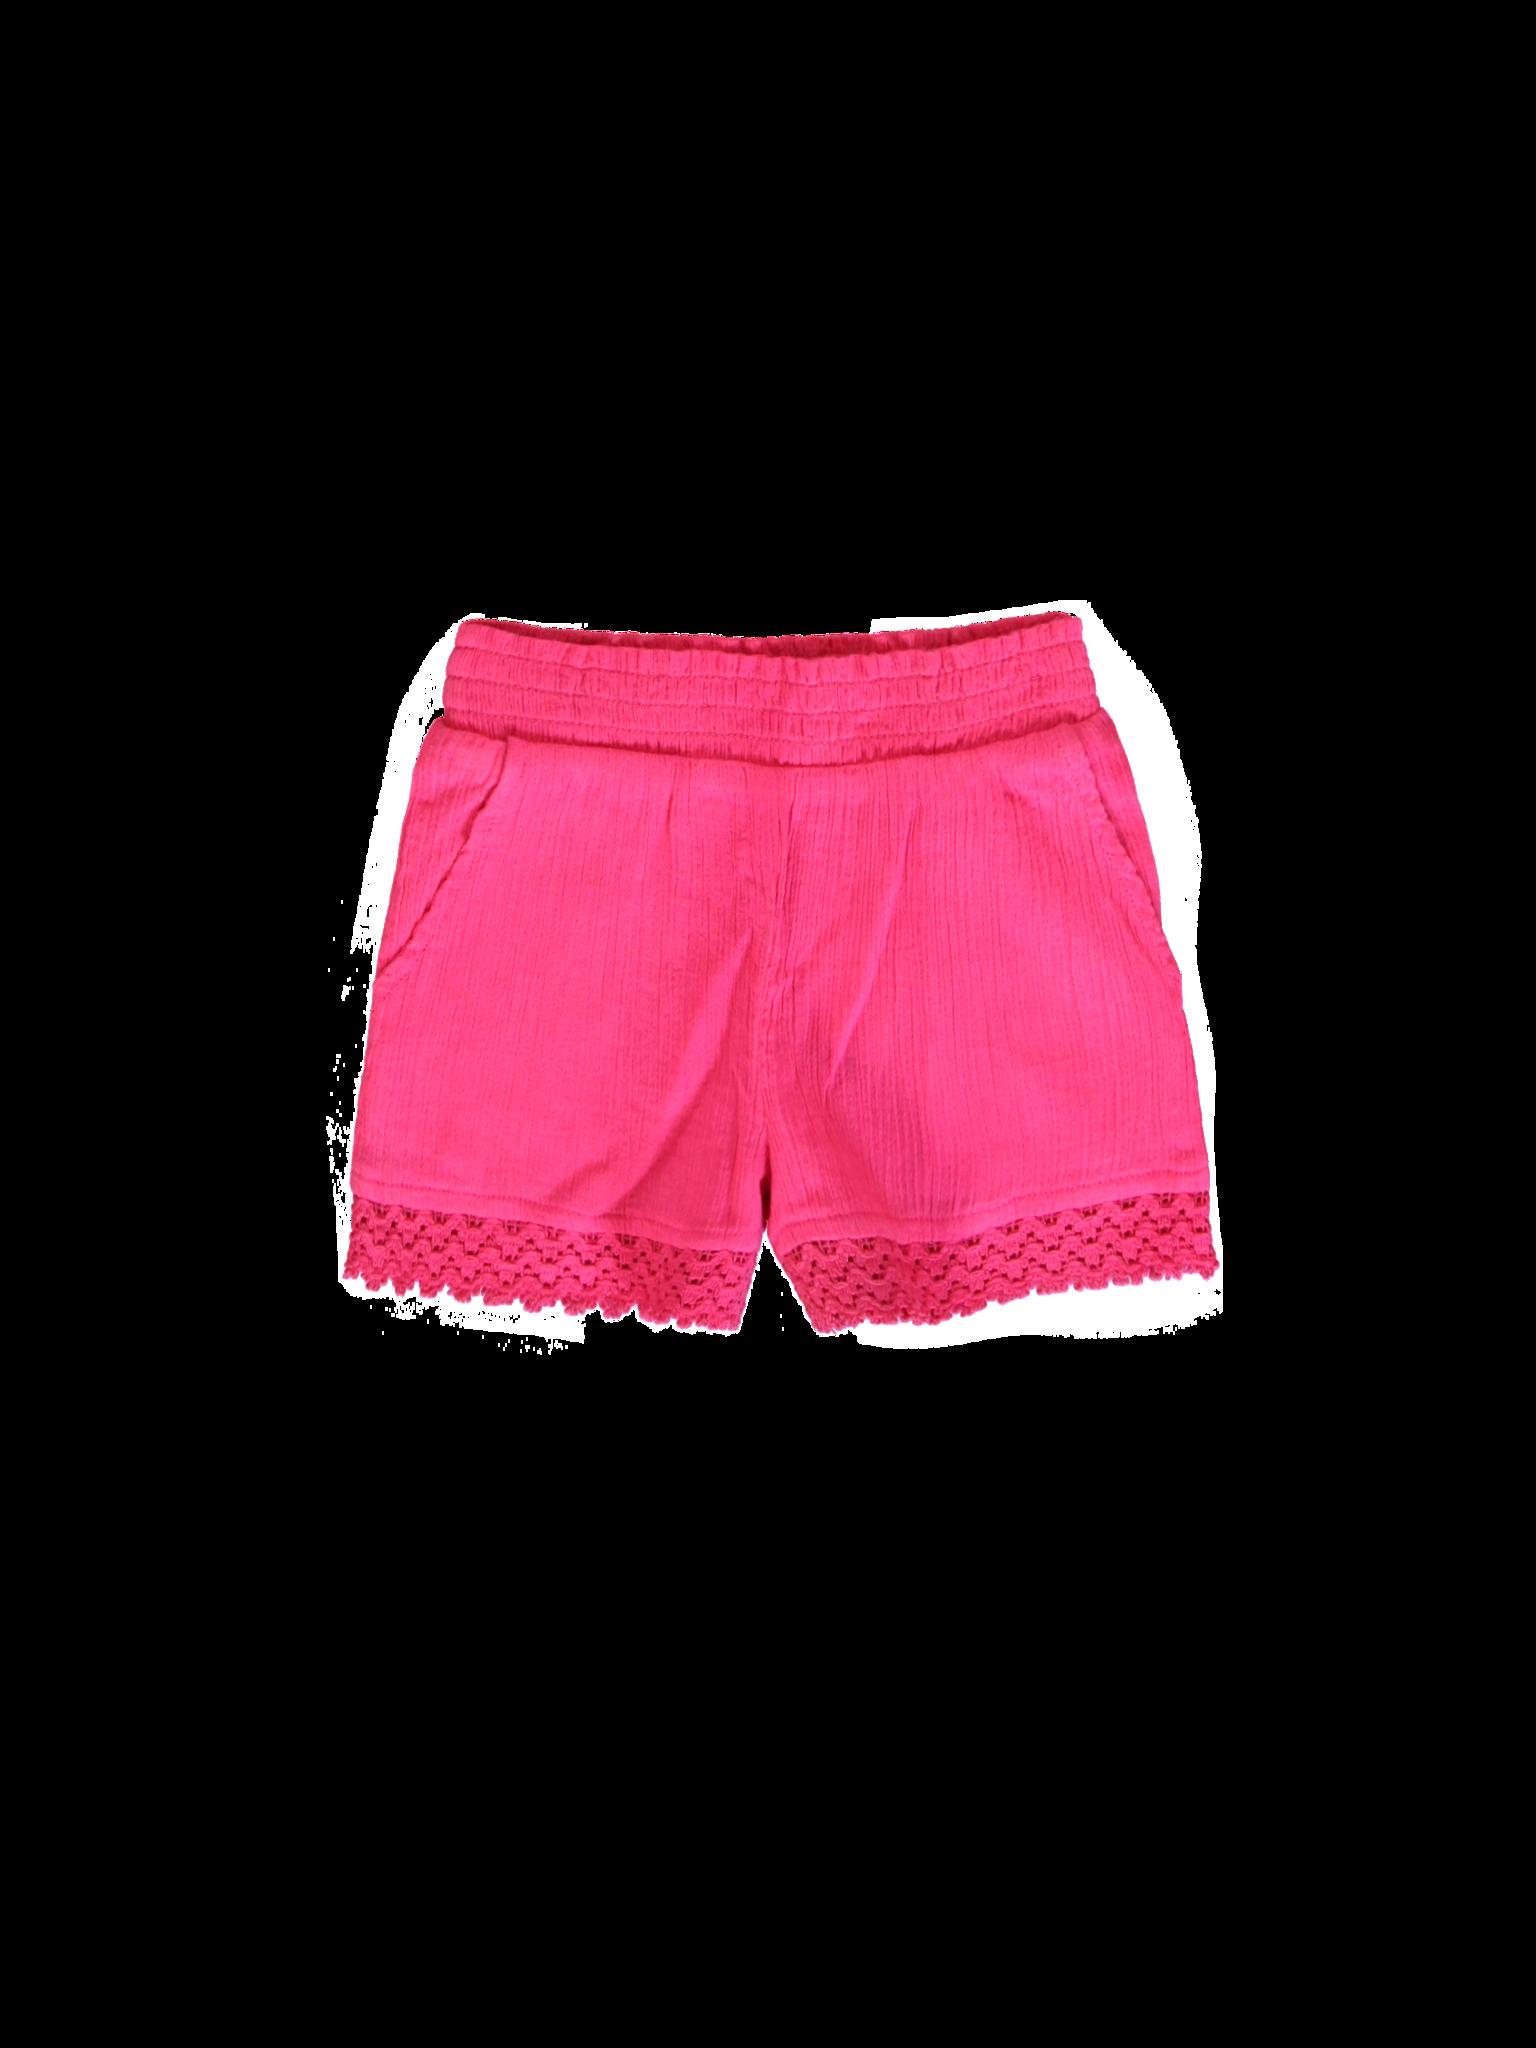 All Brands | Summerproducts Small Girls | Shorts | 10 pcs/box